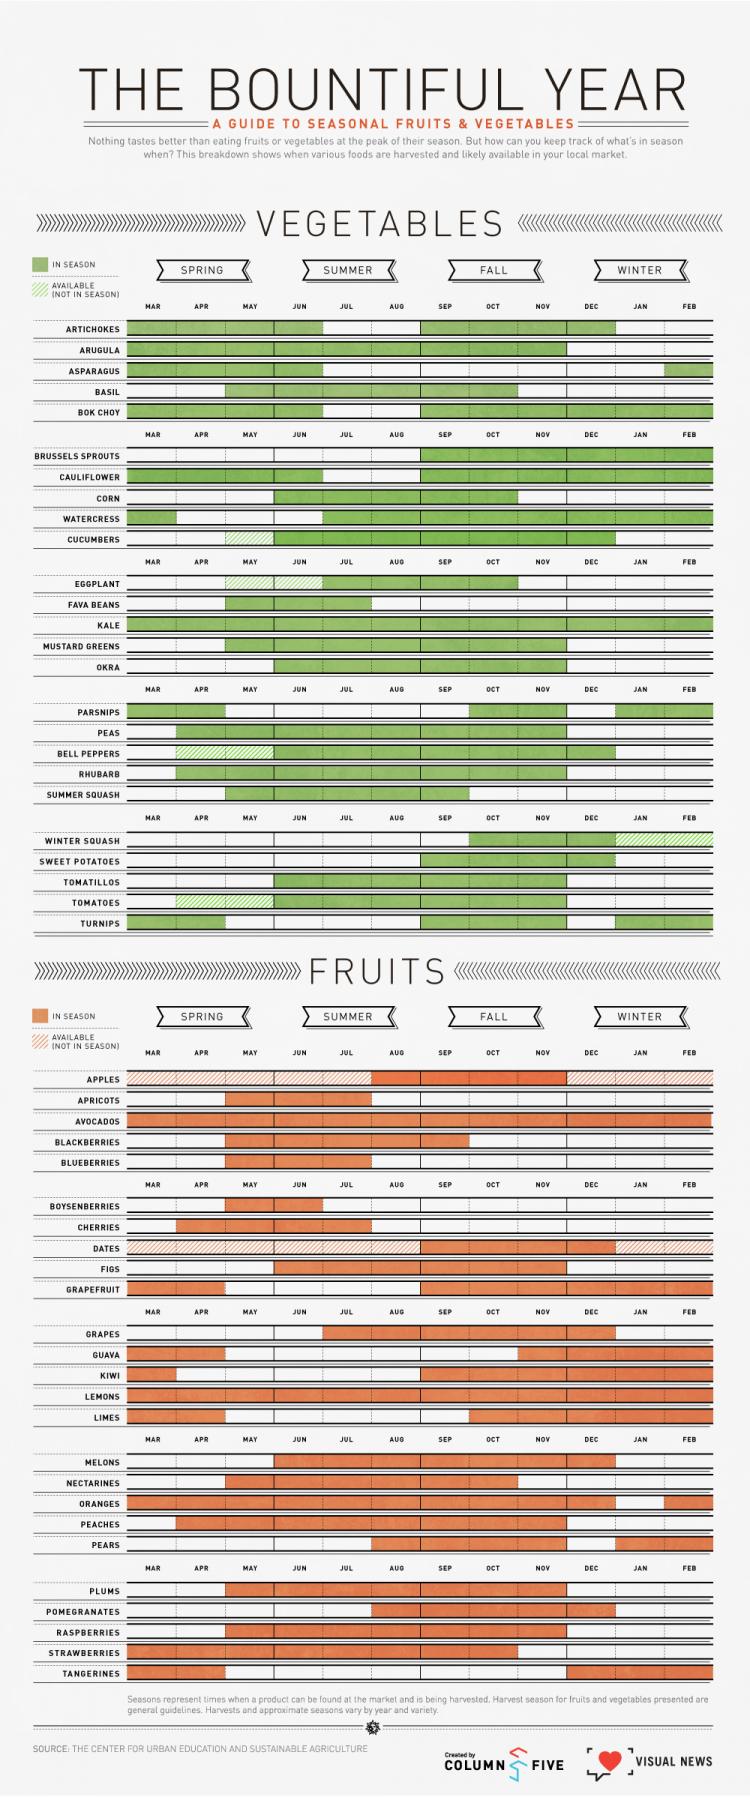 Visual News seasonal fruits and veggies 750x1797 The Bountiful Year: A Visual Guide to Seasonal Produce